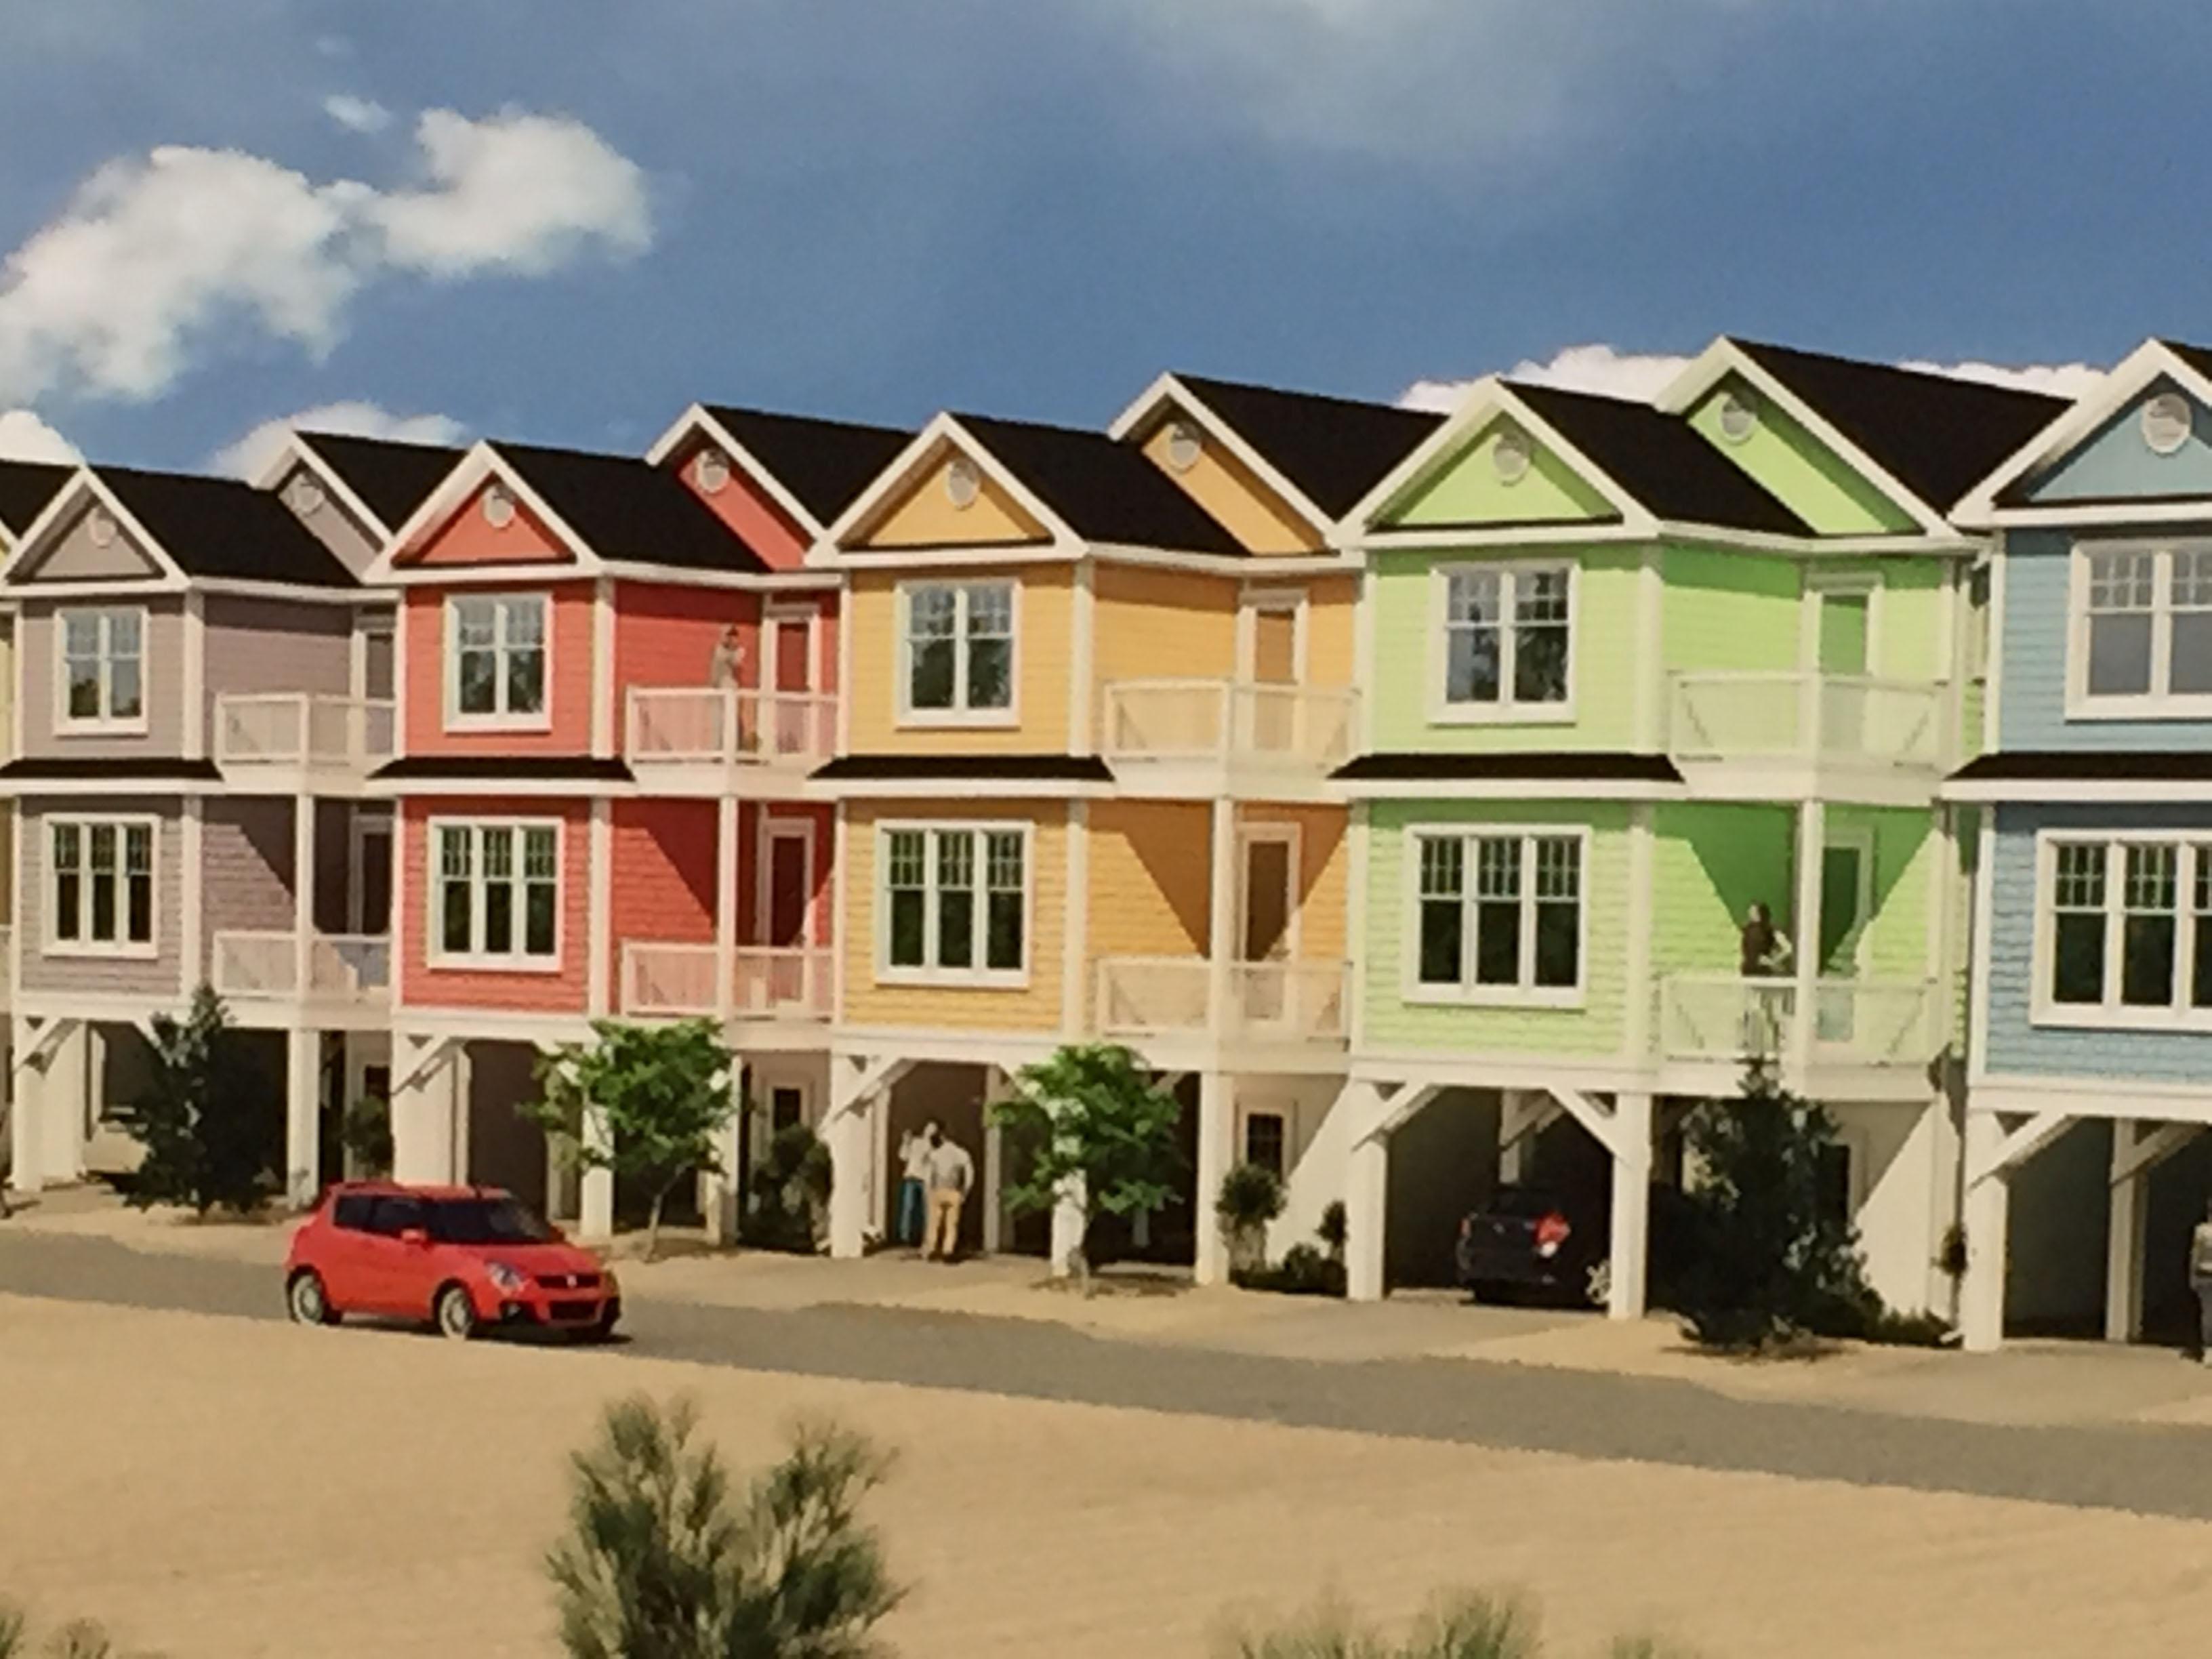 Homes proposed for Brick's Camp Osborn neighborhood. (Photo: Daniel Nee)